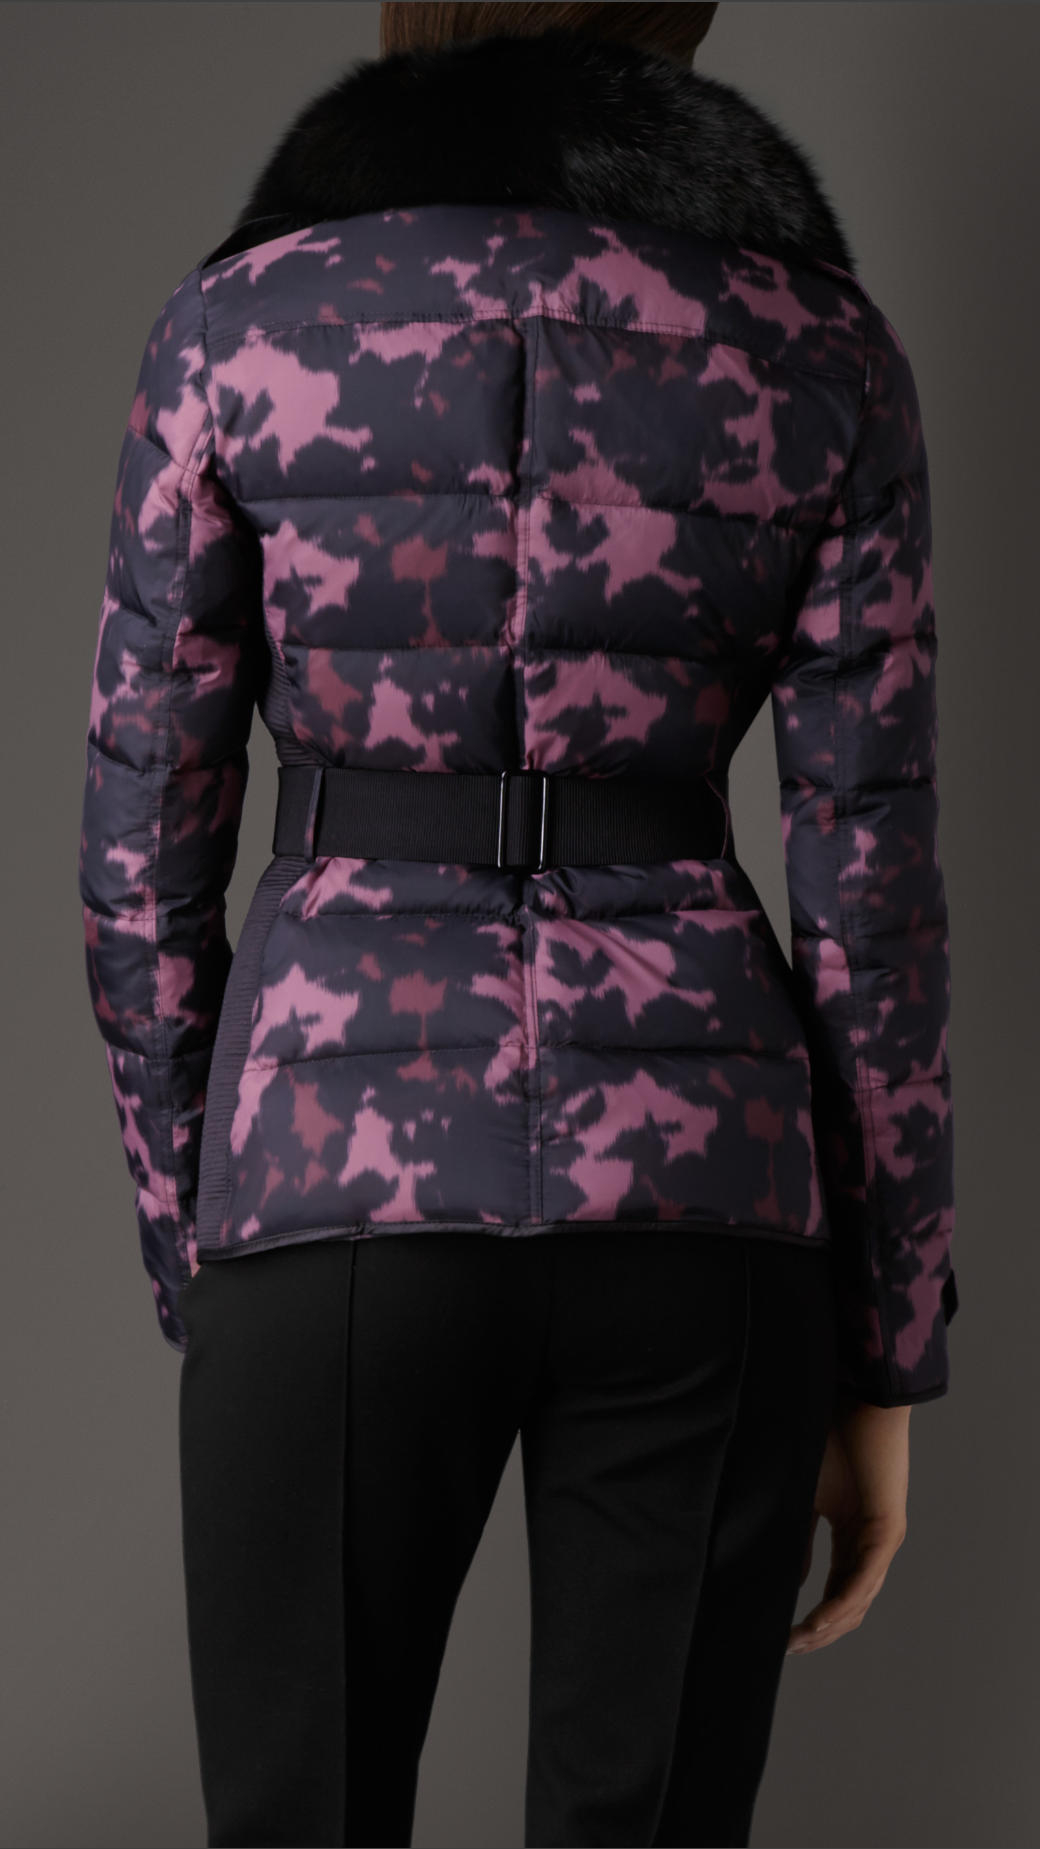 Lyst - Burberry Showerproof Puffer Jacket With Fox Fur ...